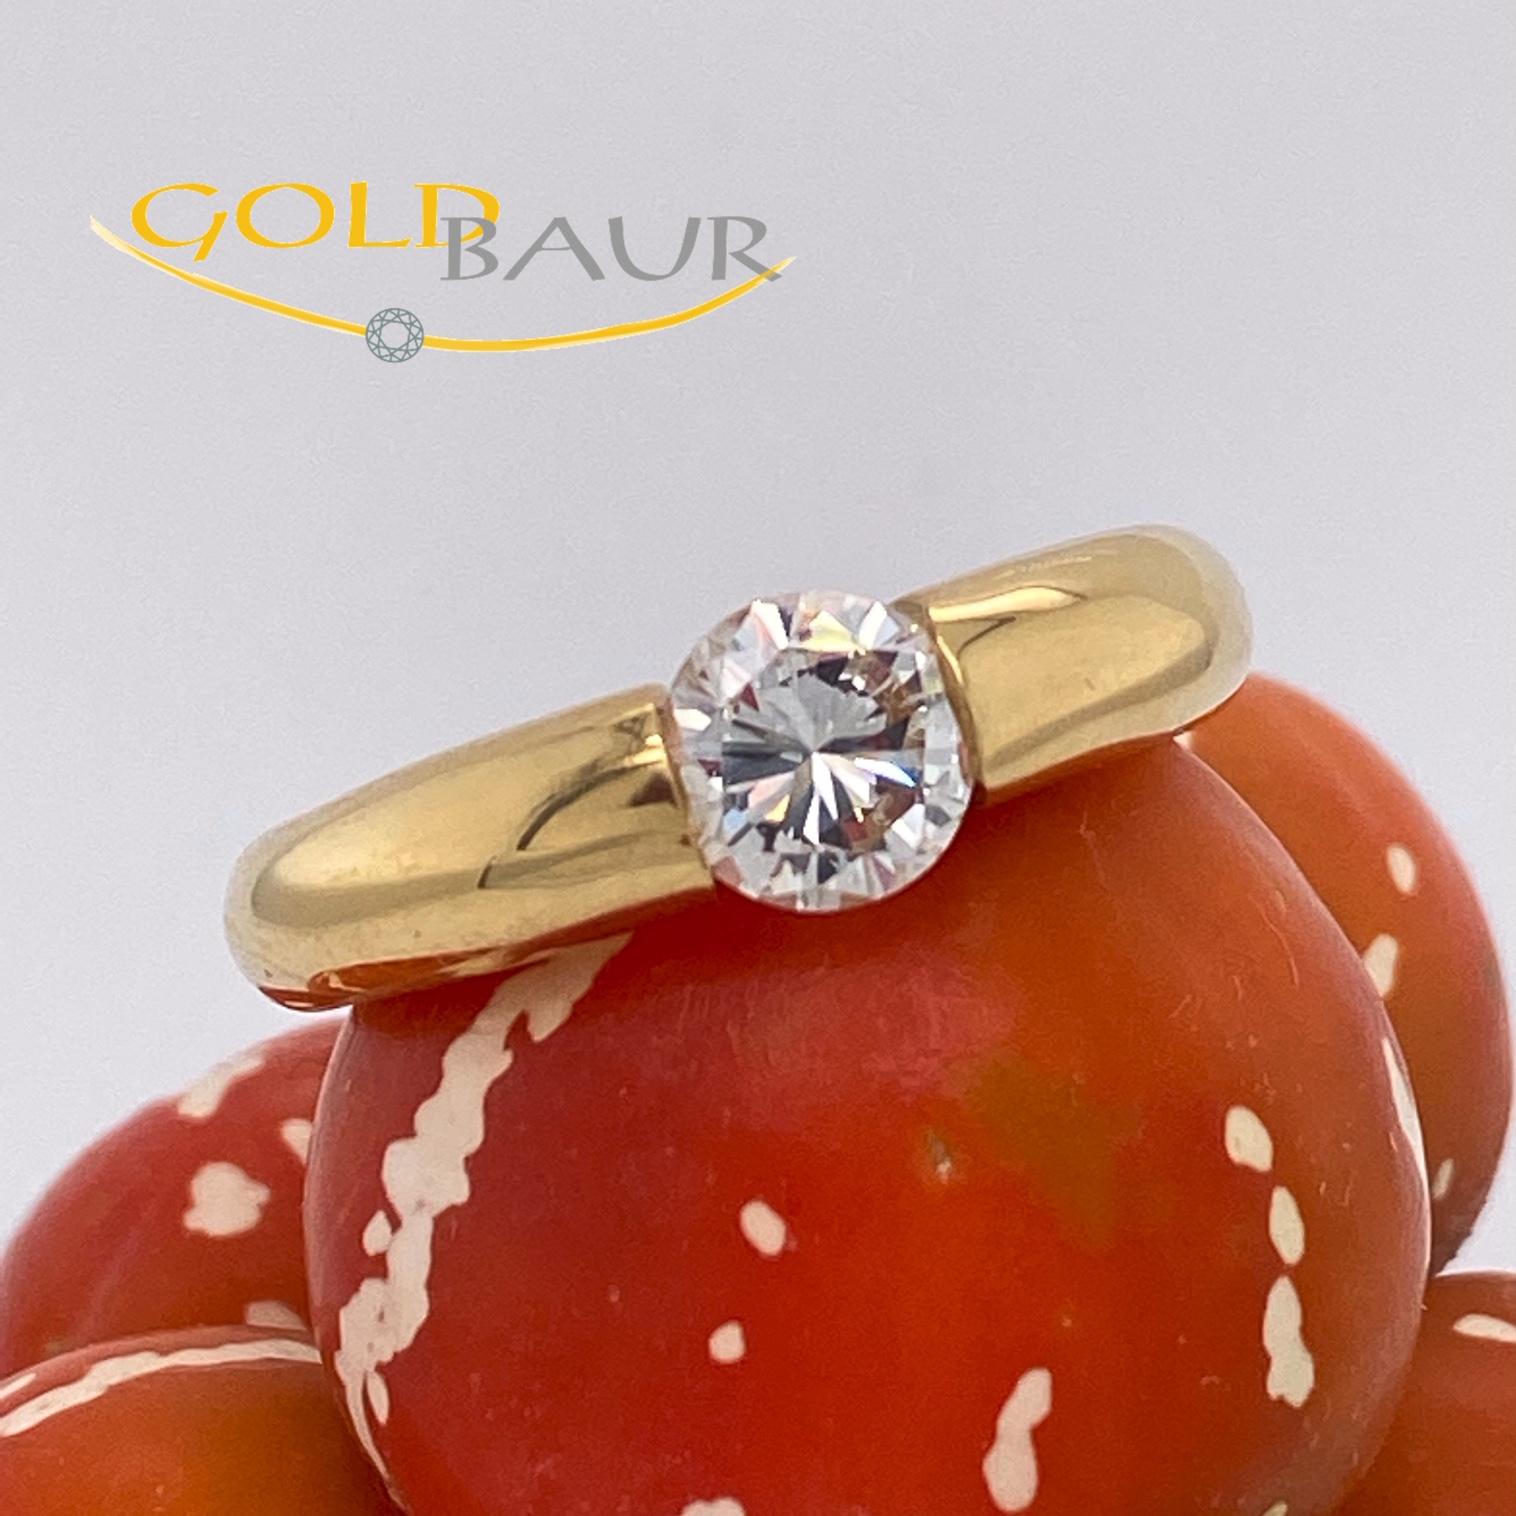 Einkaräter, Solitär, Brillant-Ring, Ring, 750/Gelbgold, Handarbeit